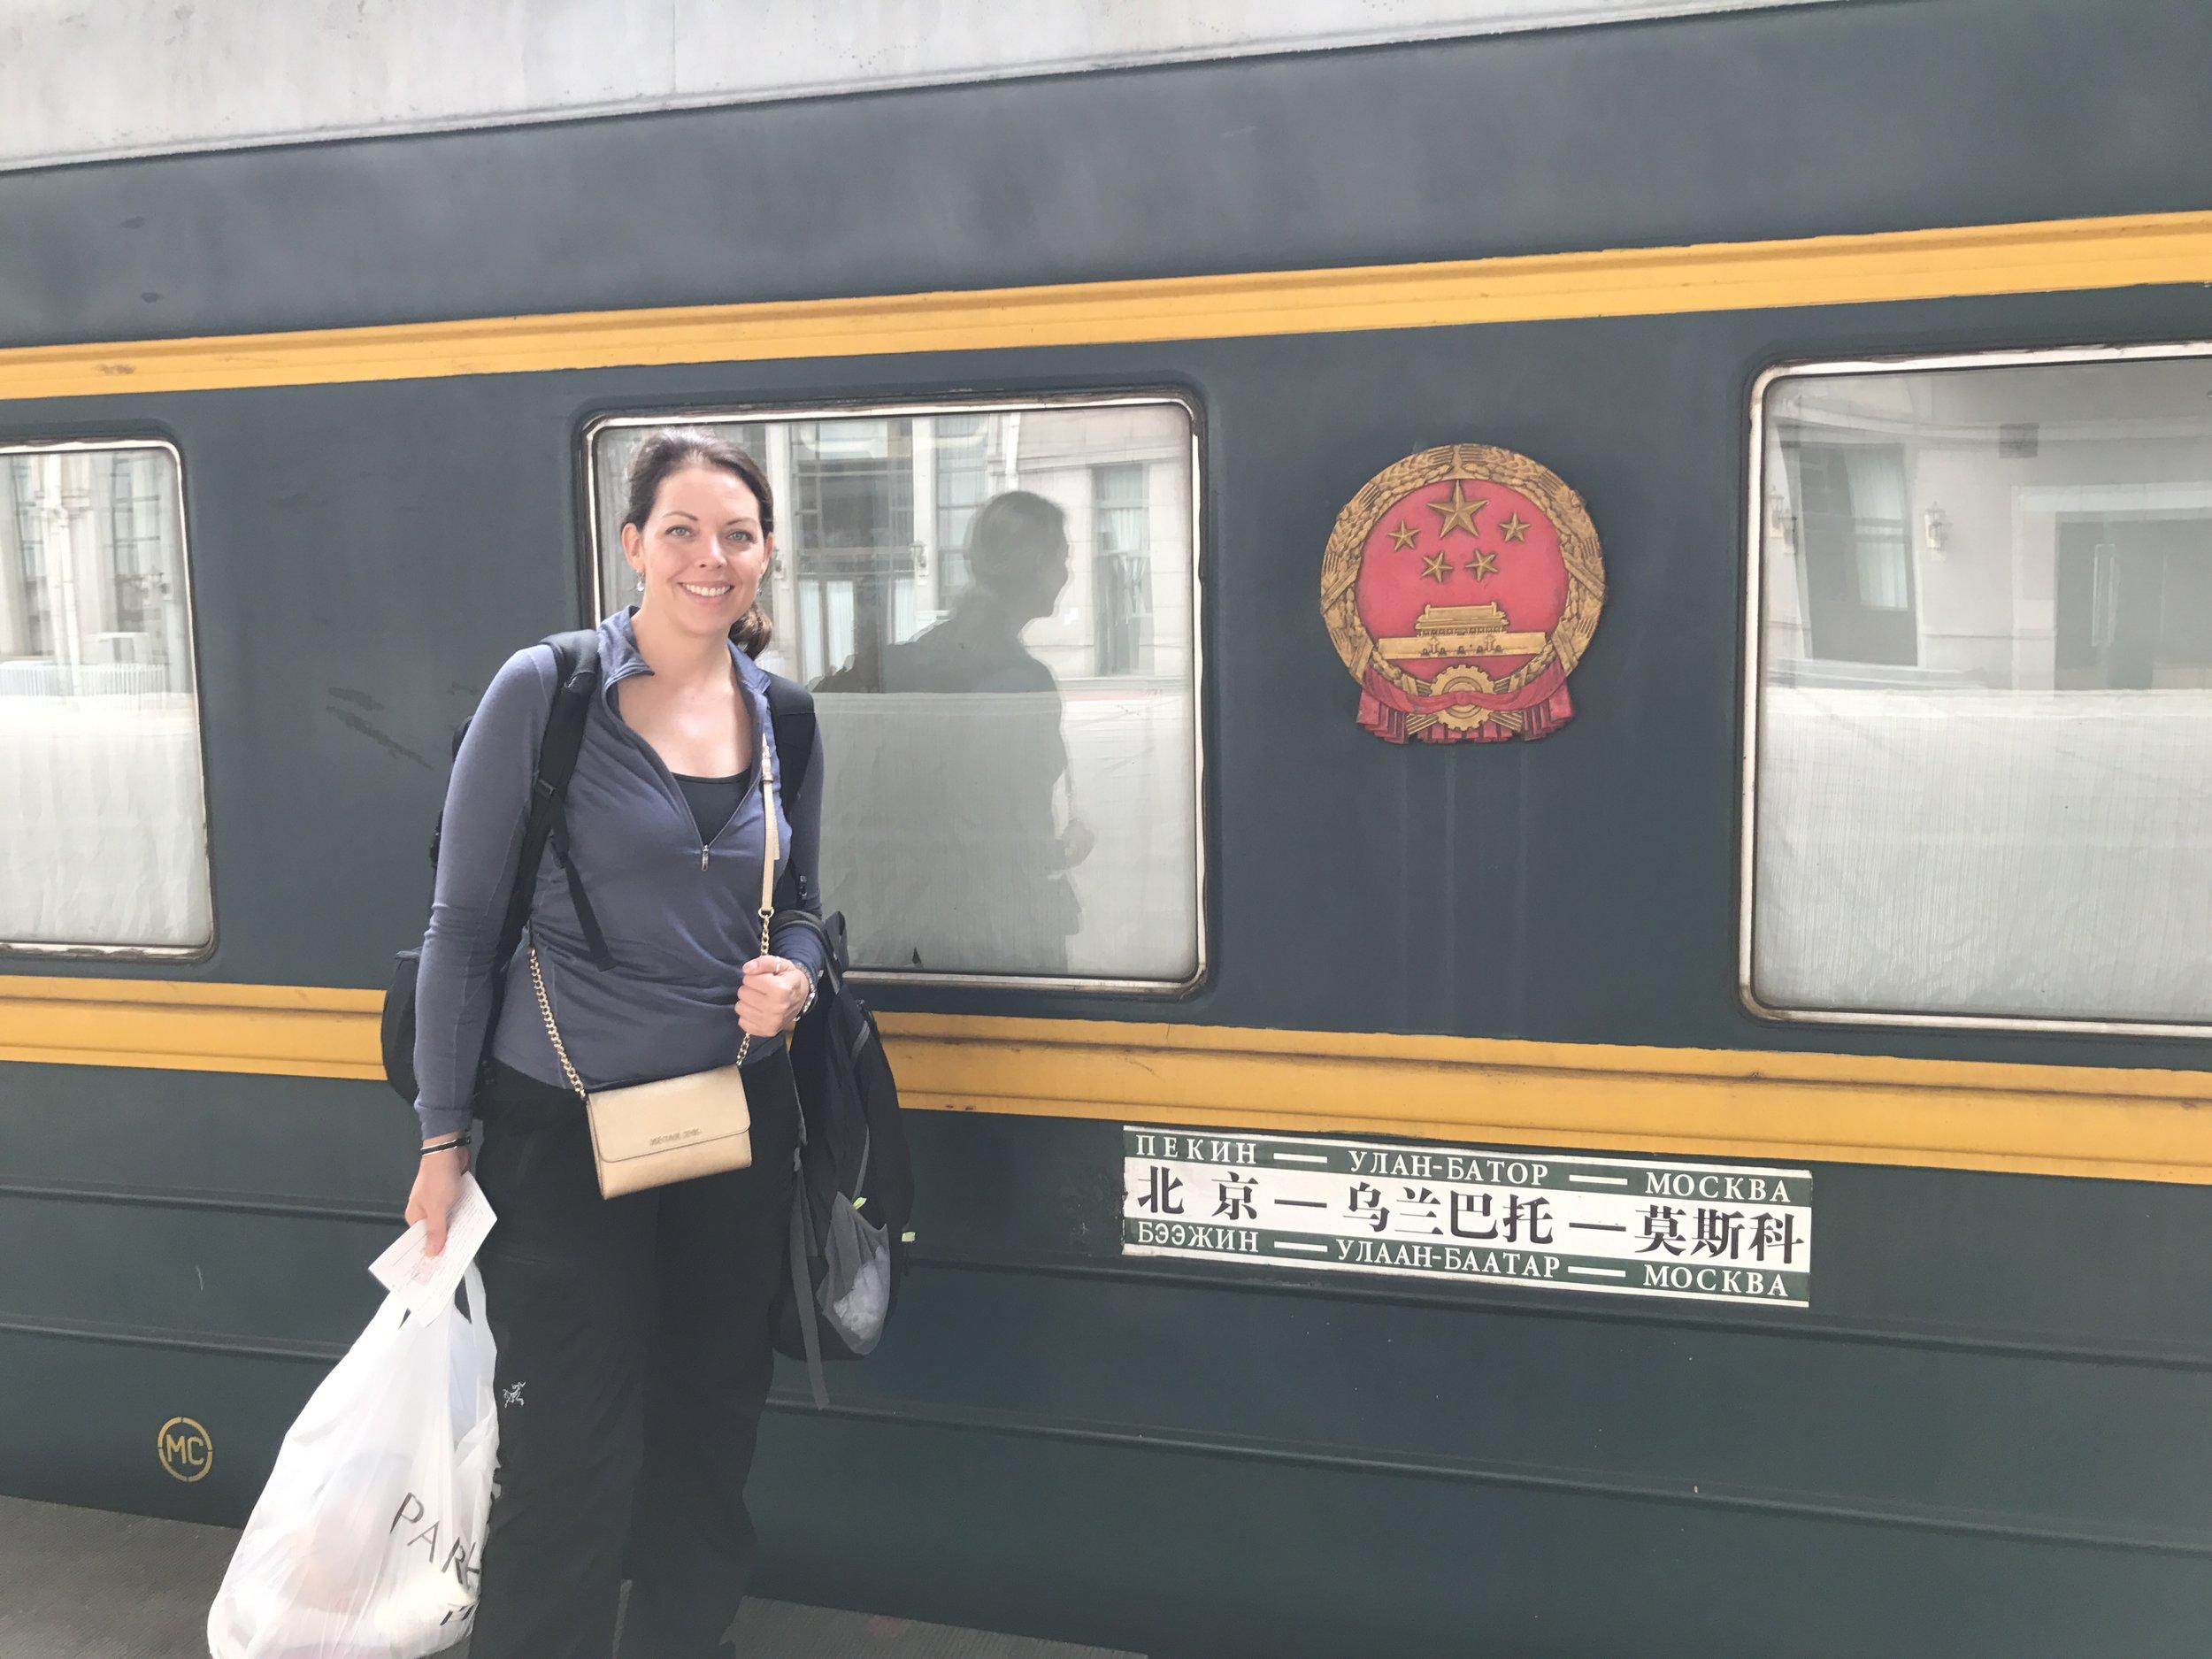 The sign reads Beijing - Ulaanbaatar - Moscow